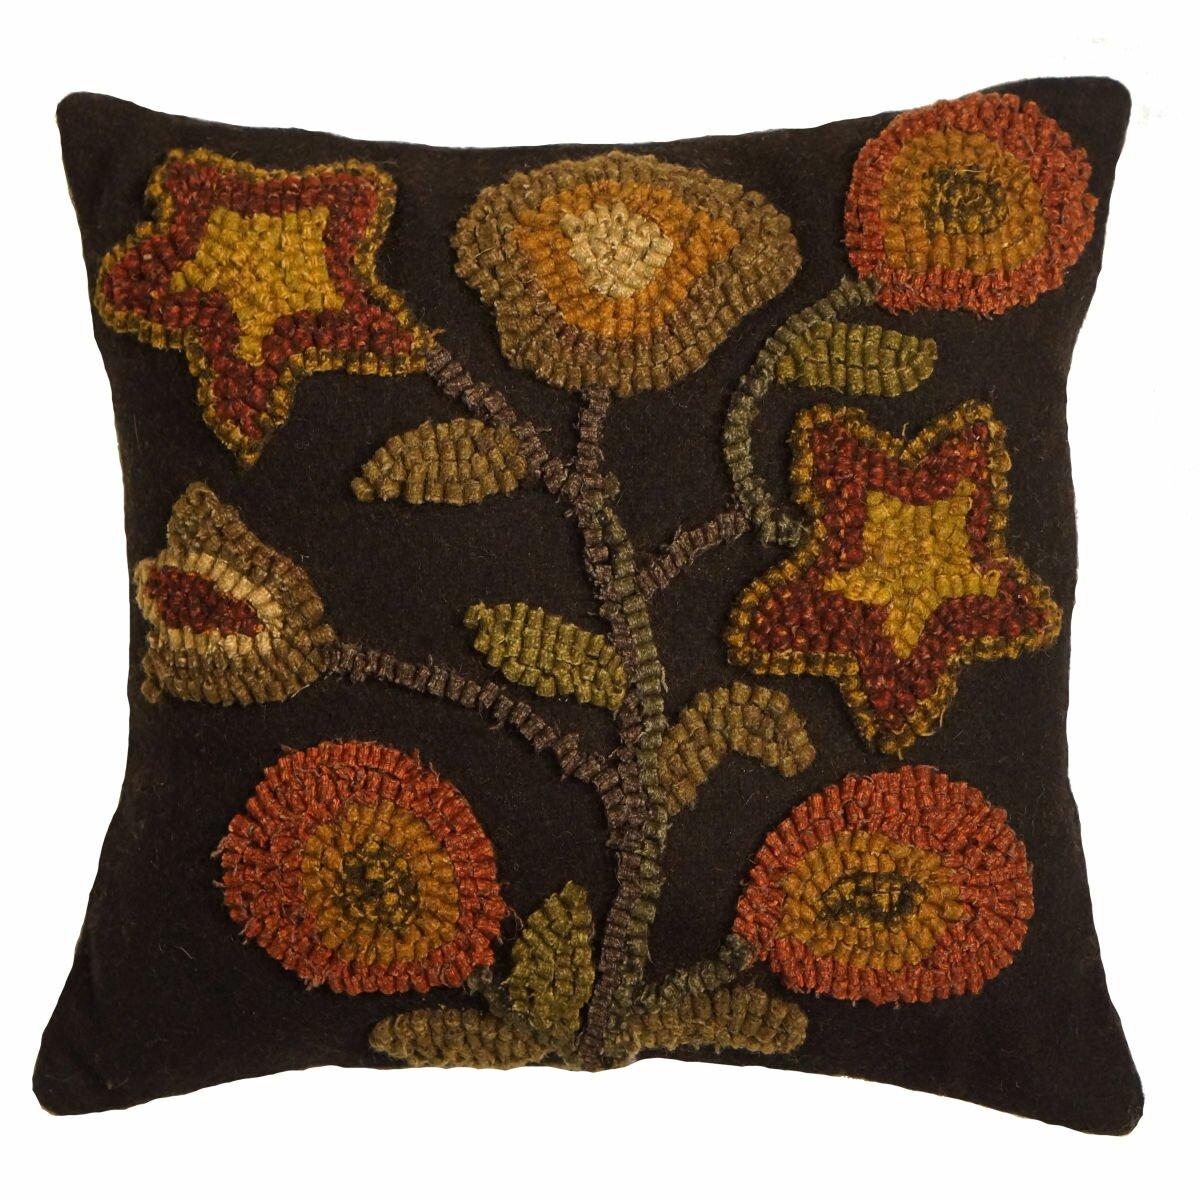 Primitive Throw Pillows For Couch : Homespice Decor Primitive Stargazer Handcrafted Throw Pillow & Reviews Wayfair